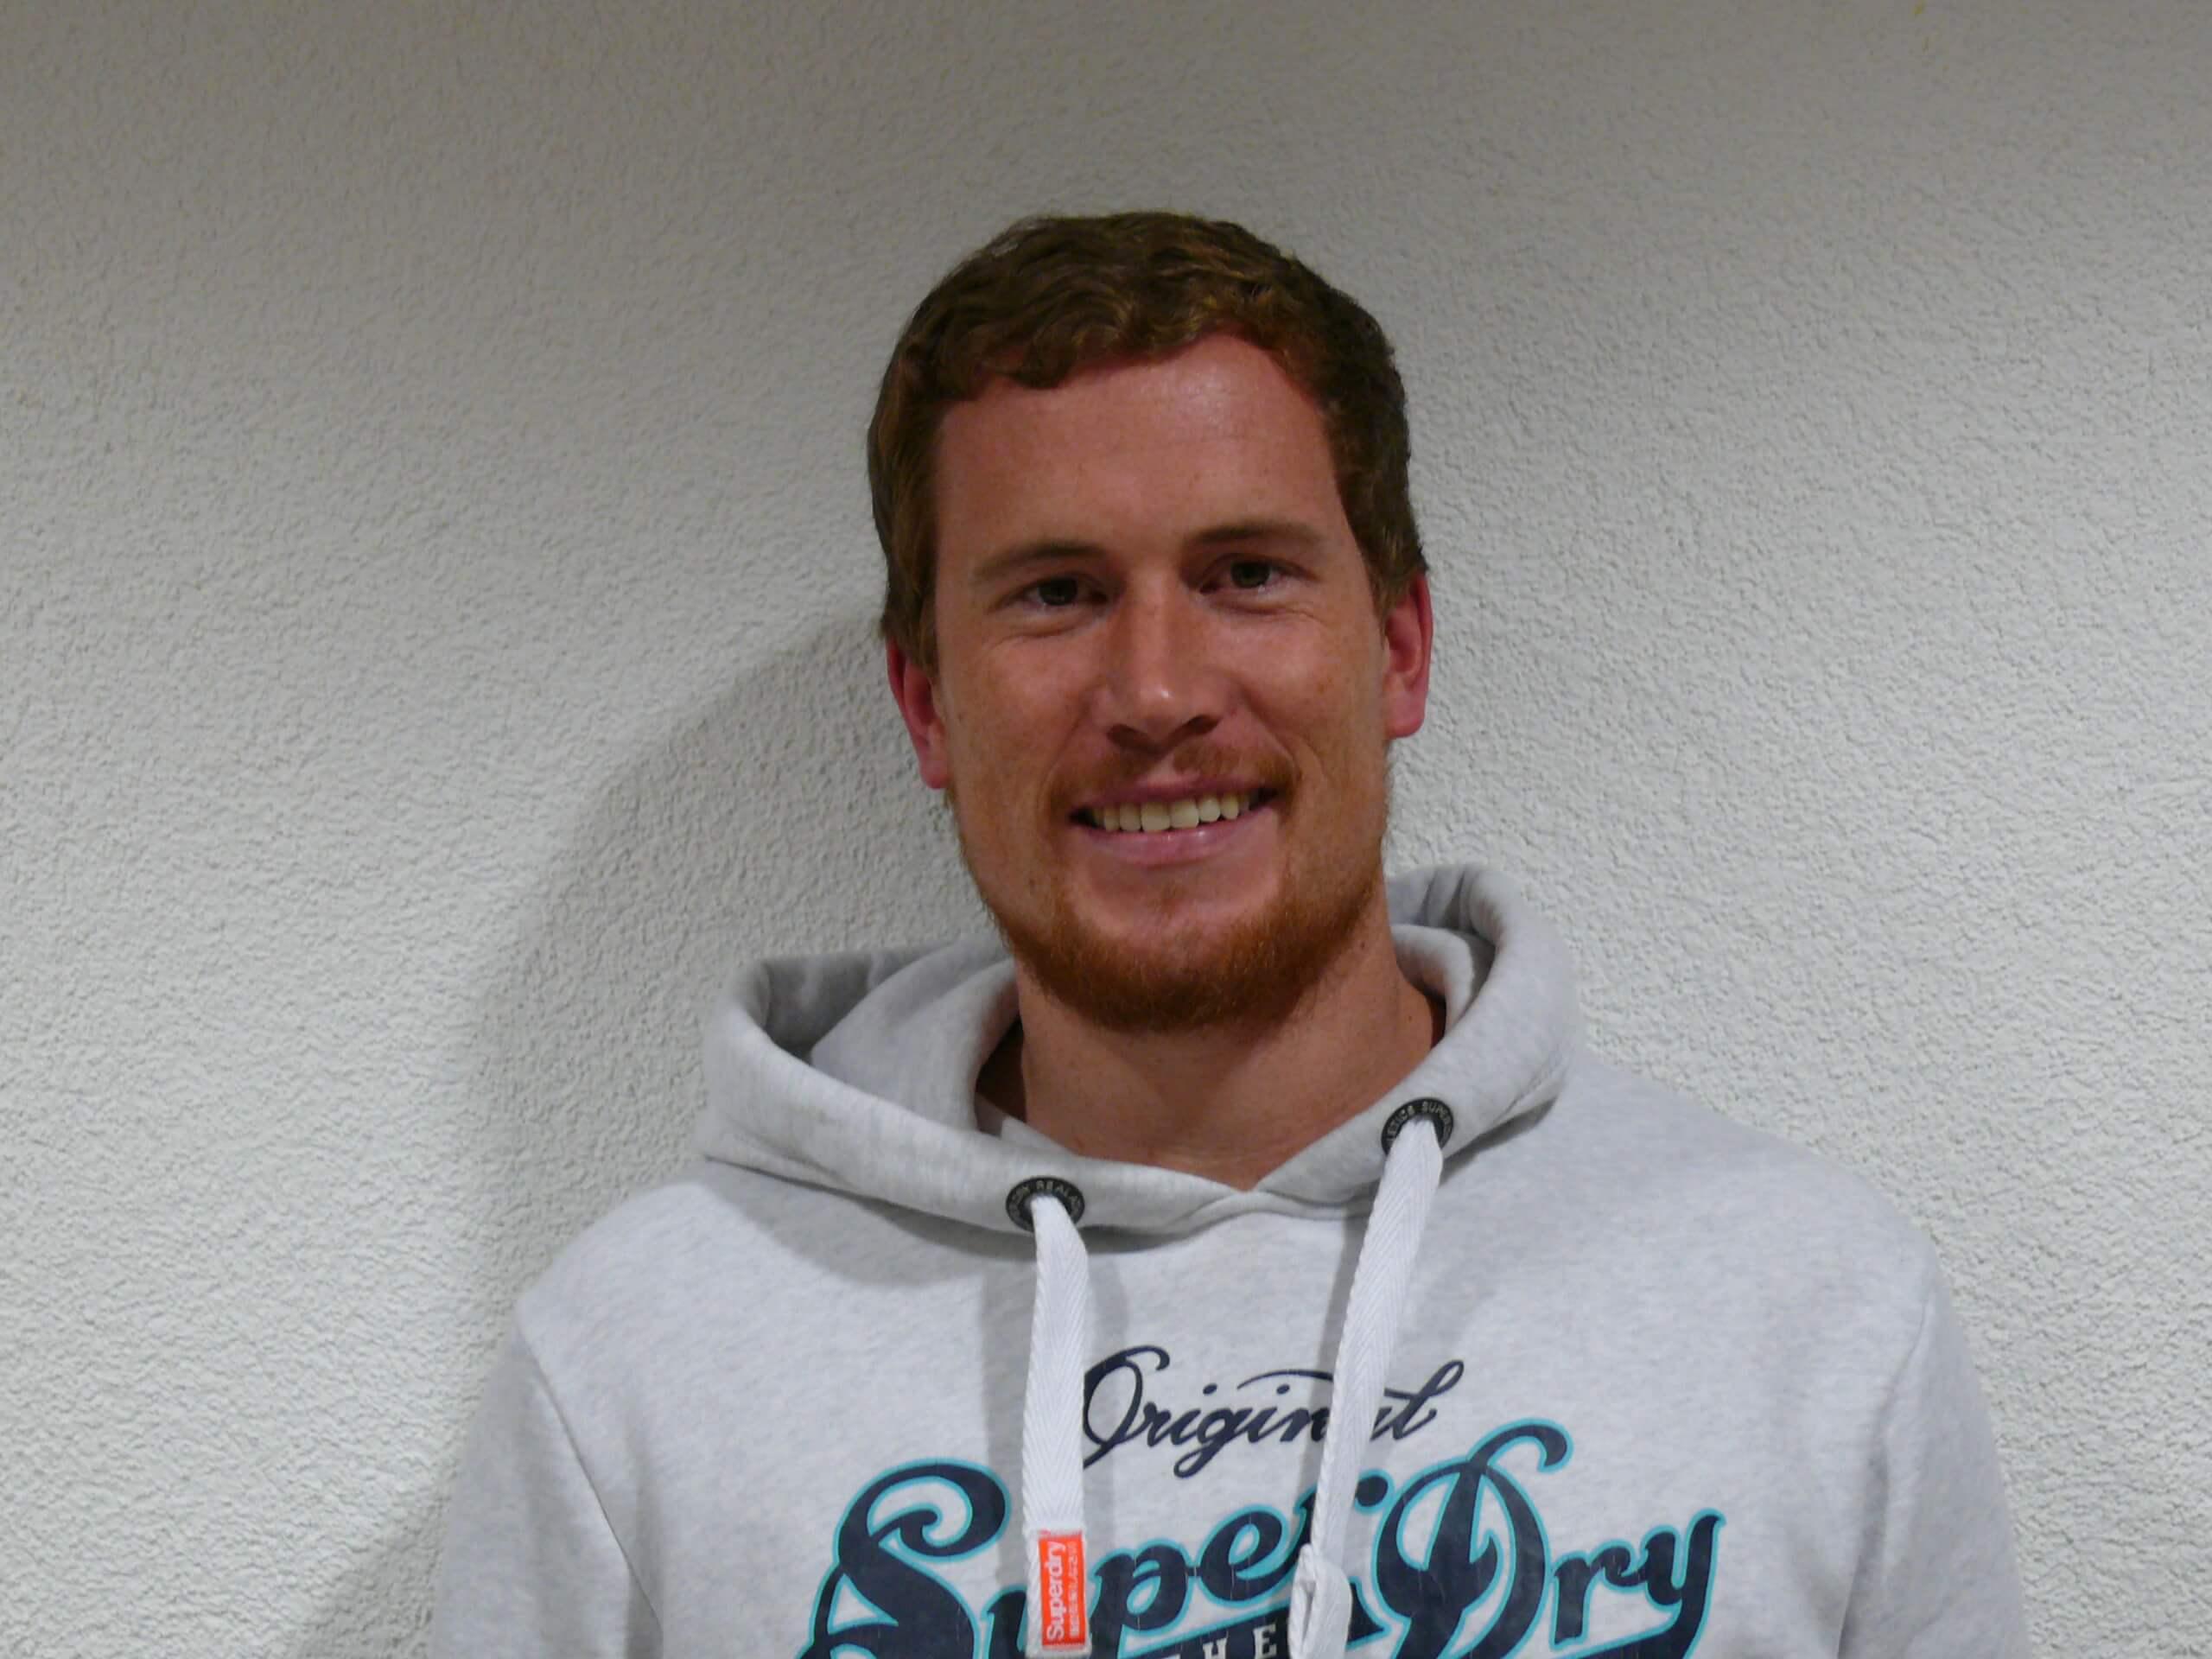 Marcel Pogadl